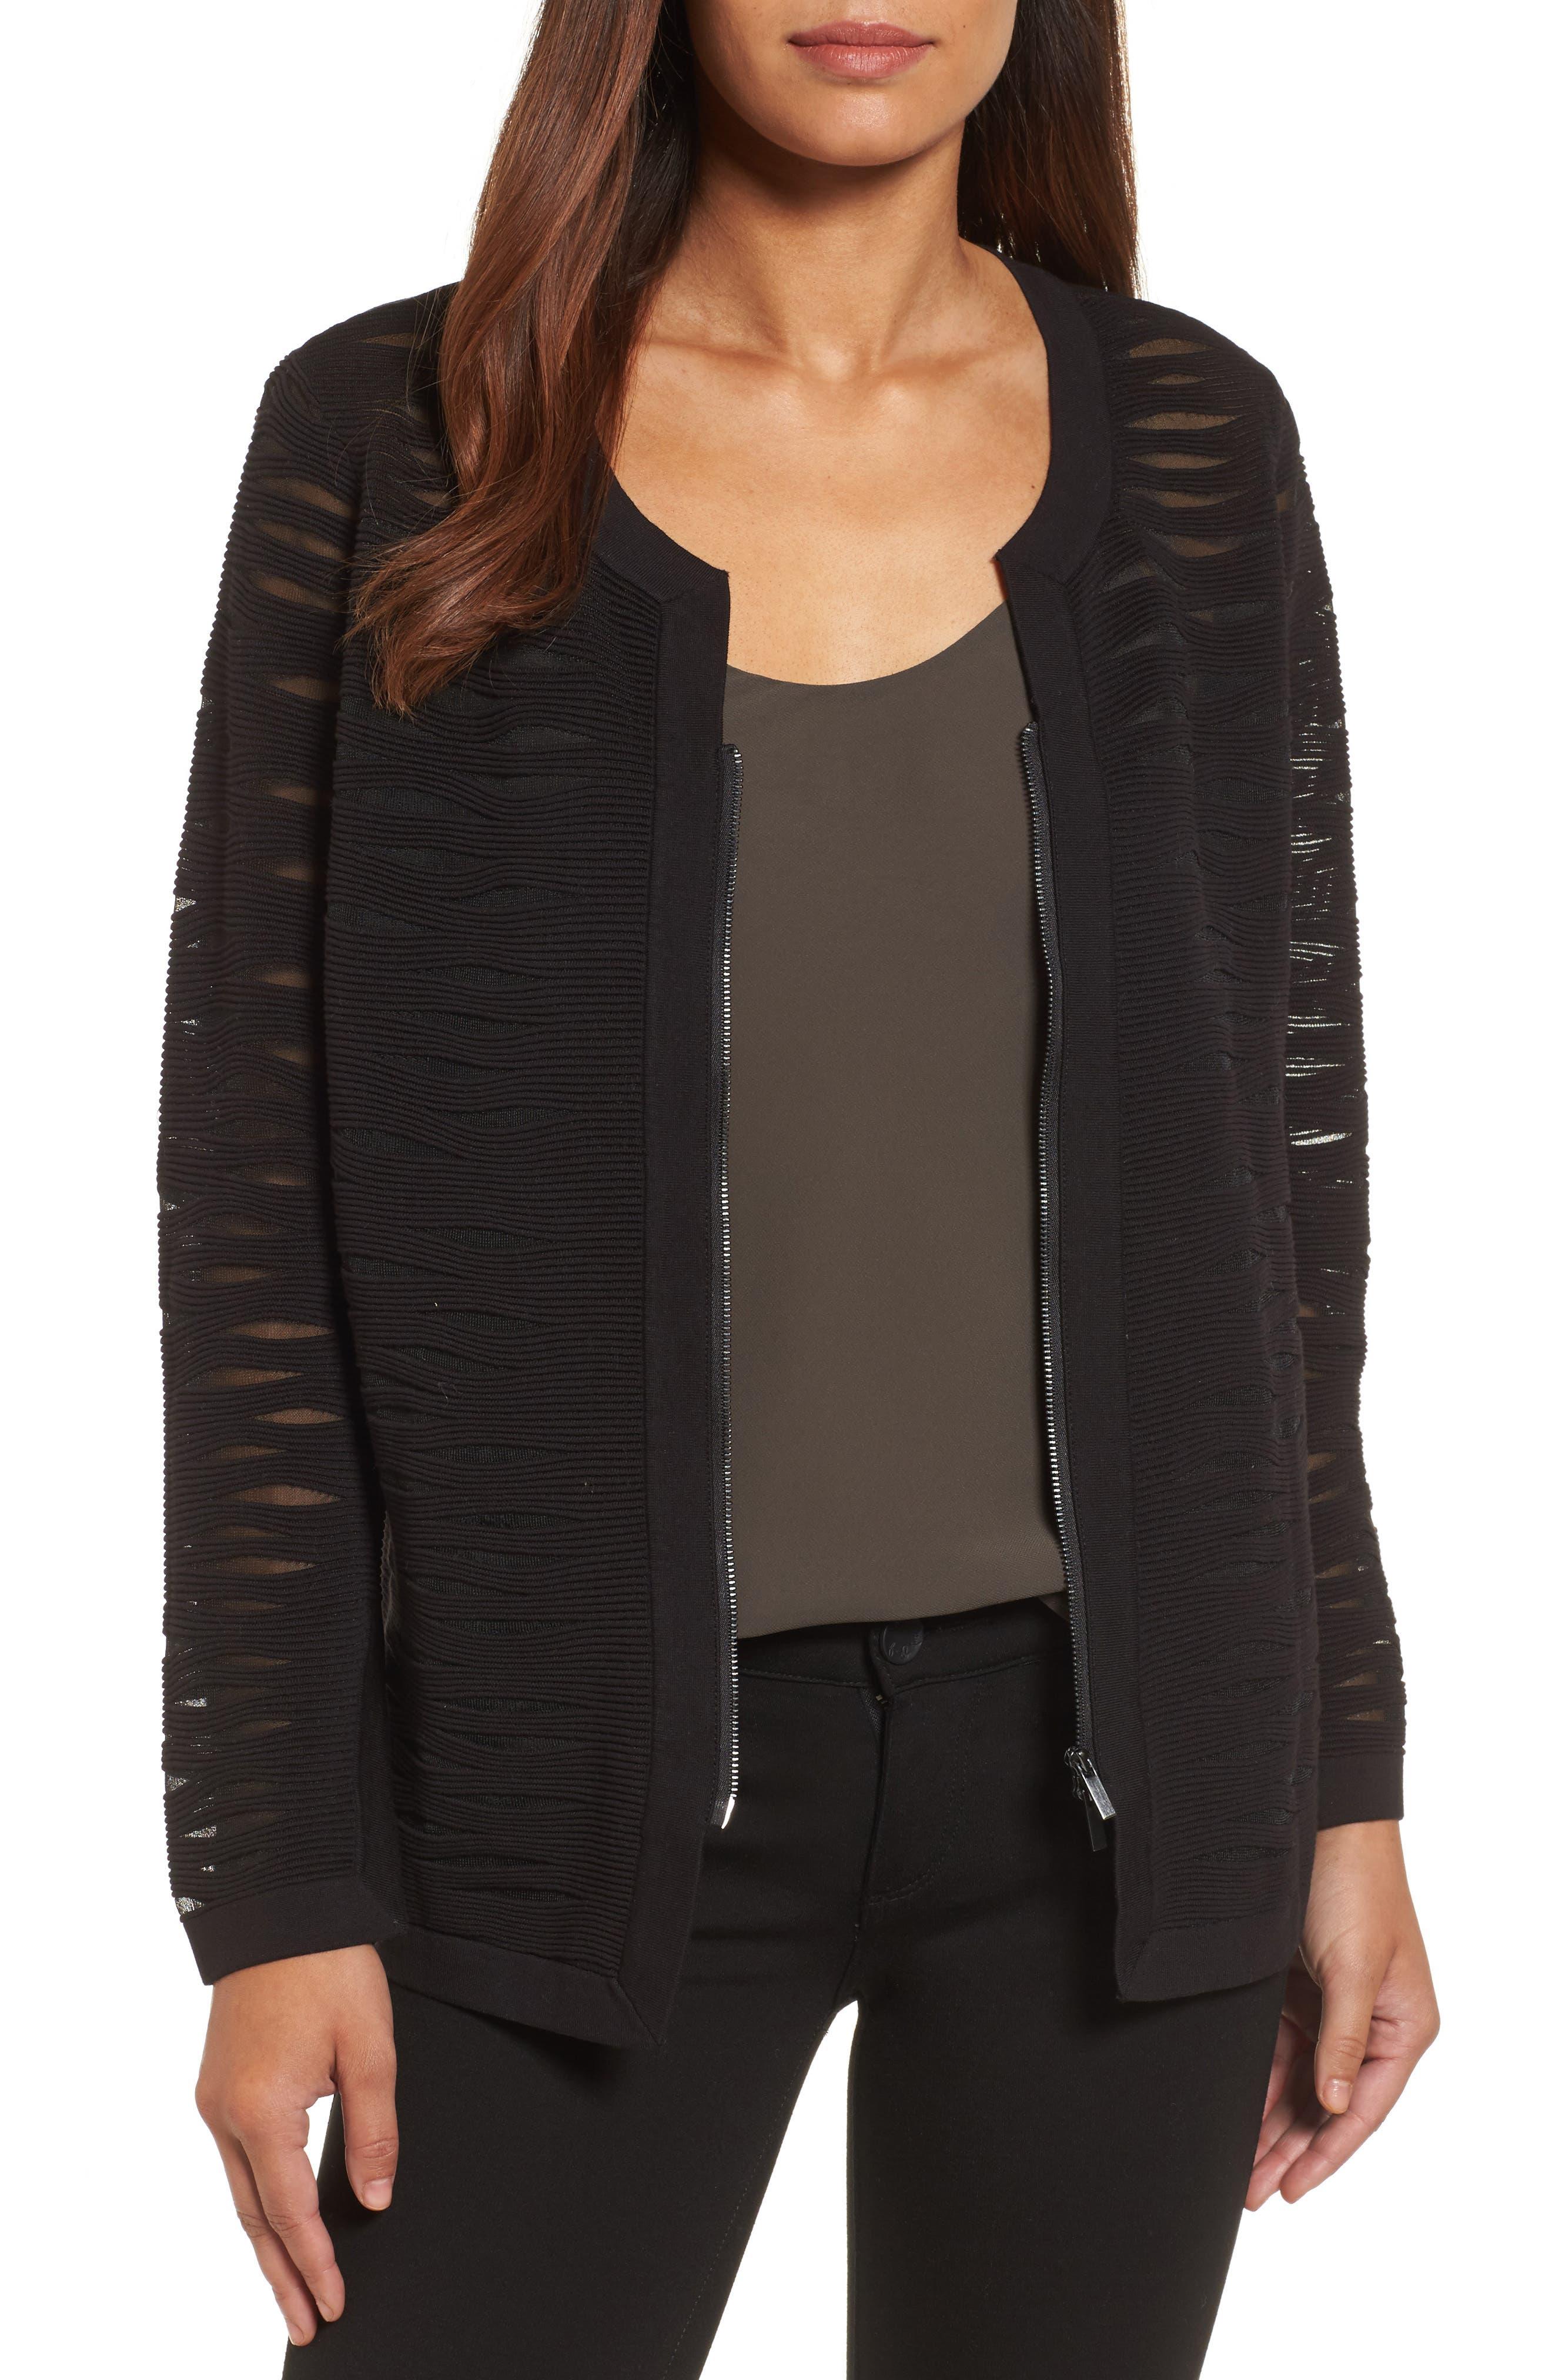 Alternate Image 1 Selected - NIC+ZOE Aurora Jacket (Regular & Petite)